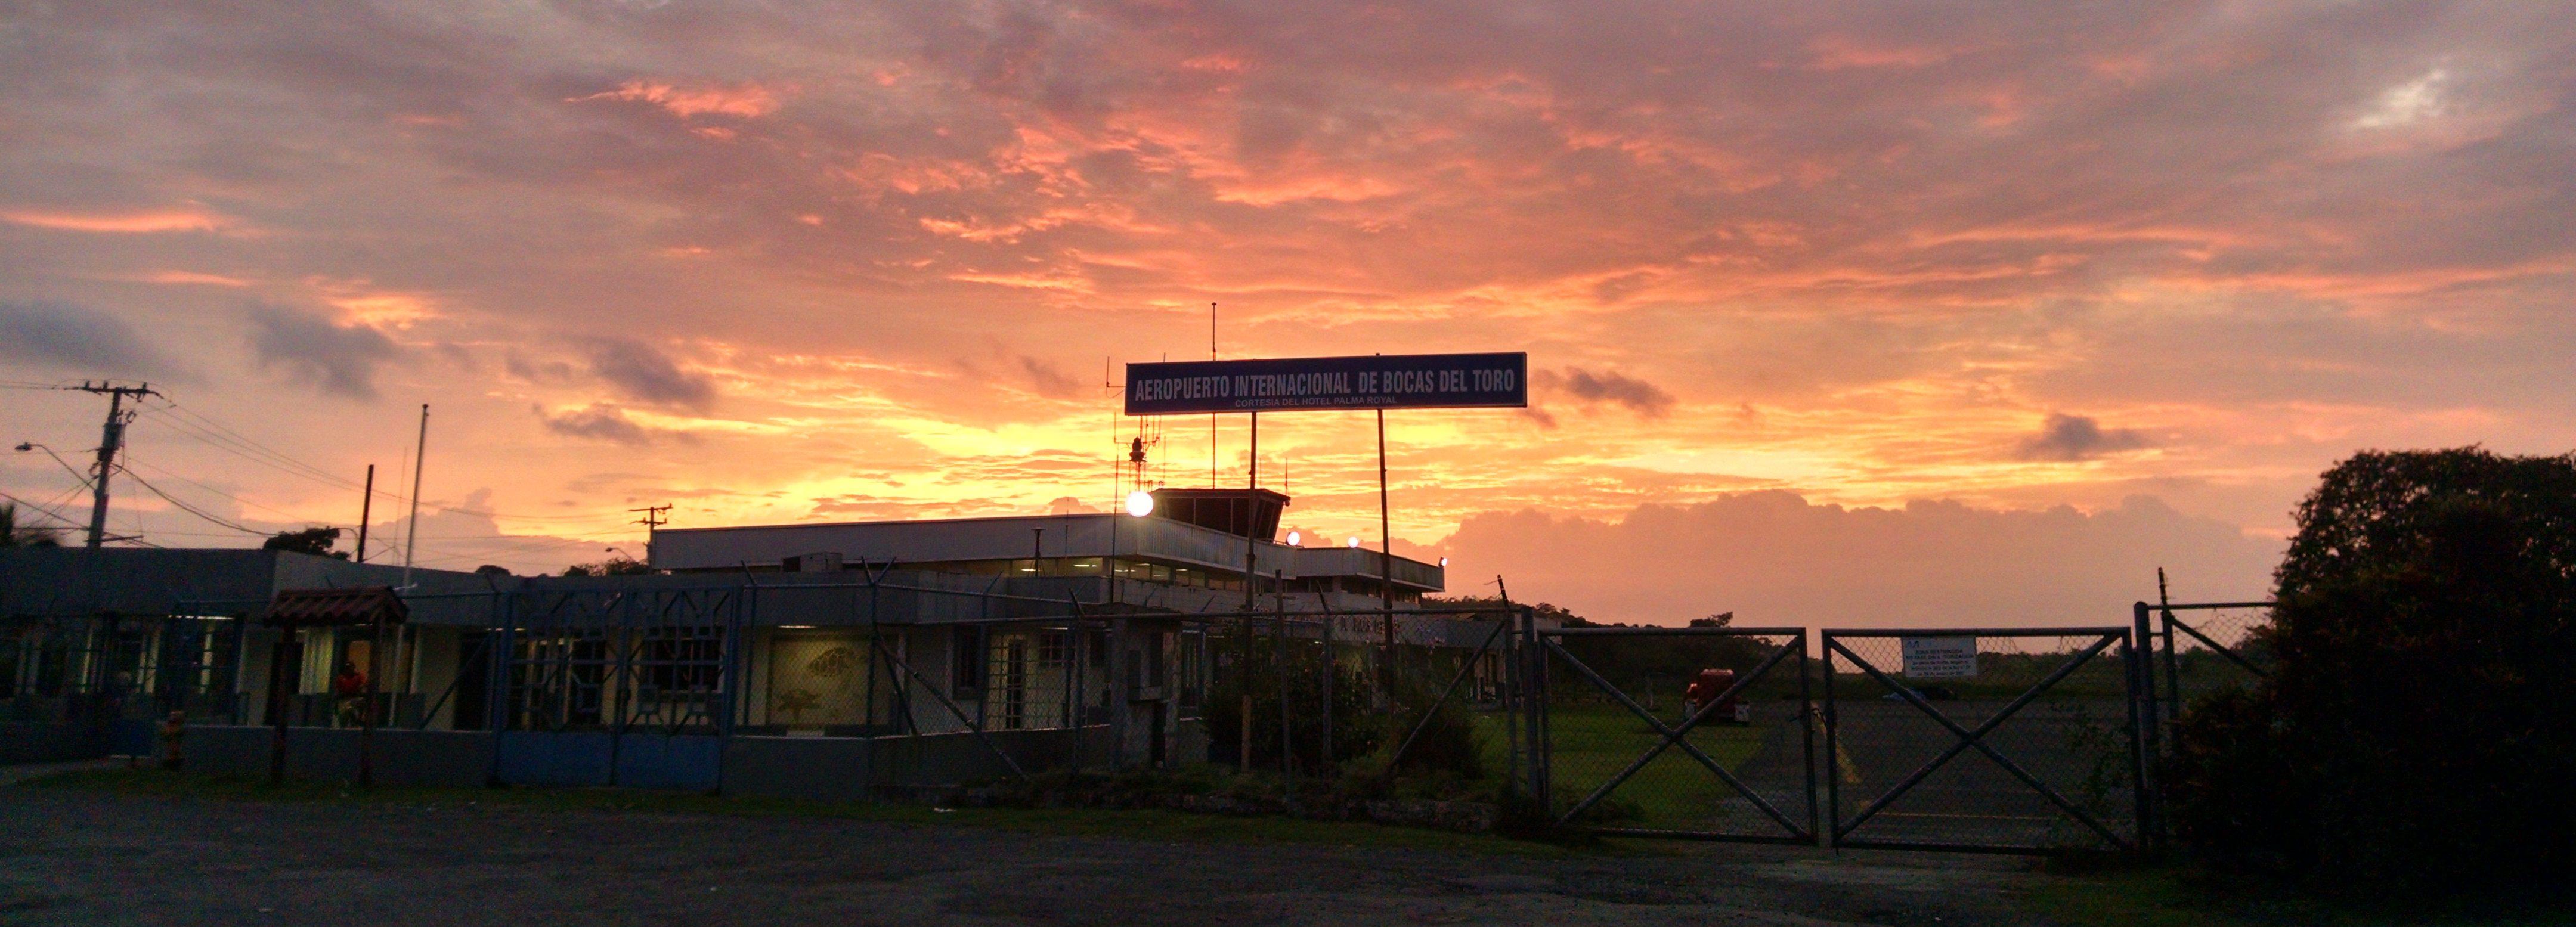 Bocas del Toro Airport